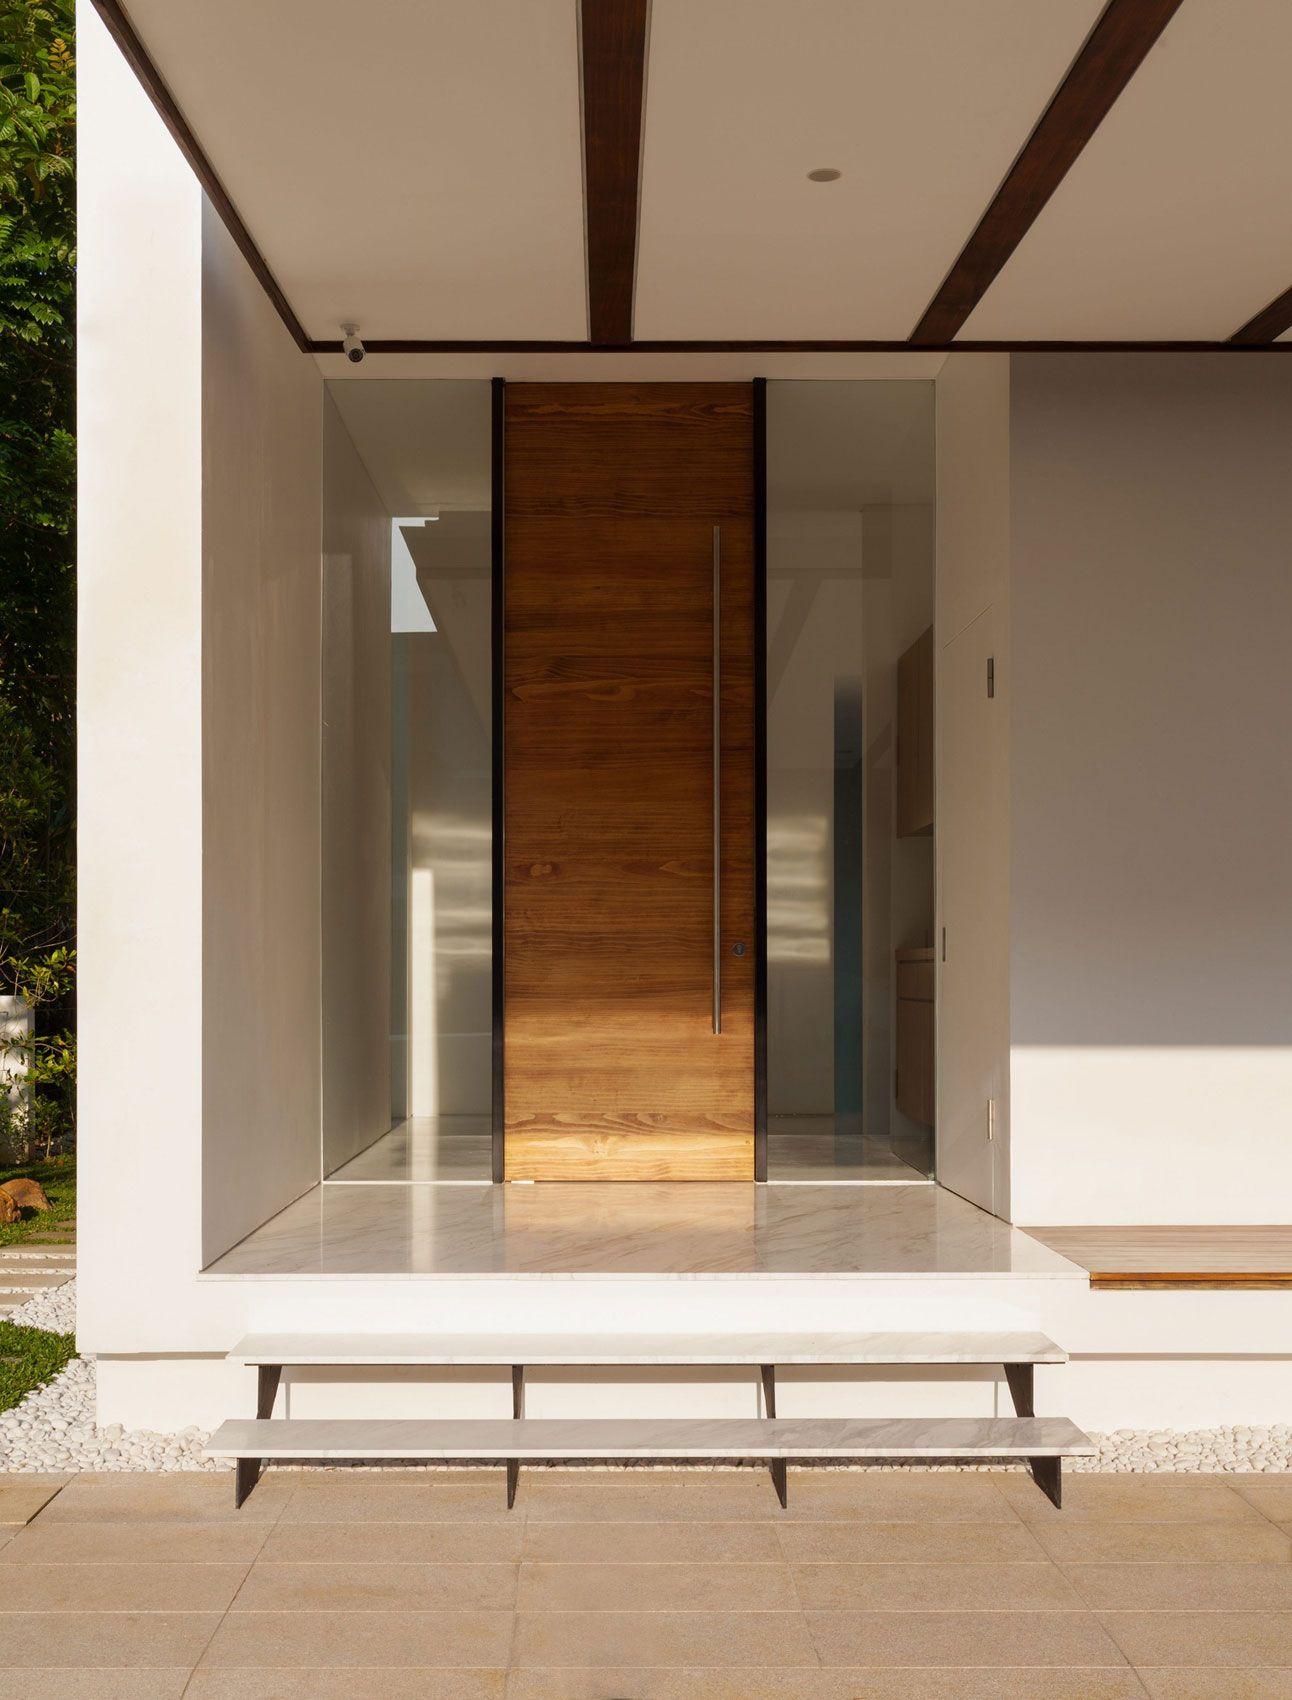 Modern entry doors with sidelights - Interior Minimalist Contemporary Home Interior Design With Courtyard Wooden Door Between Glass Window